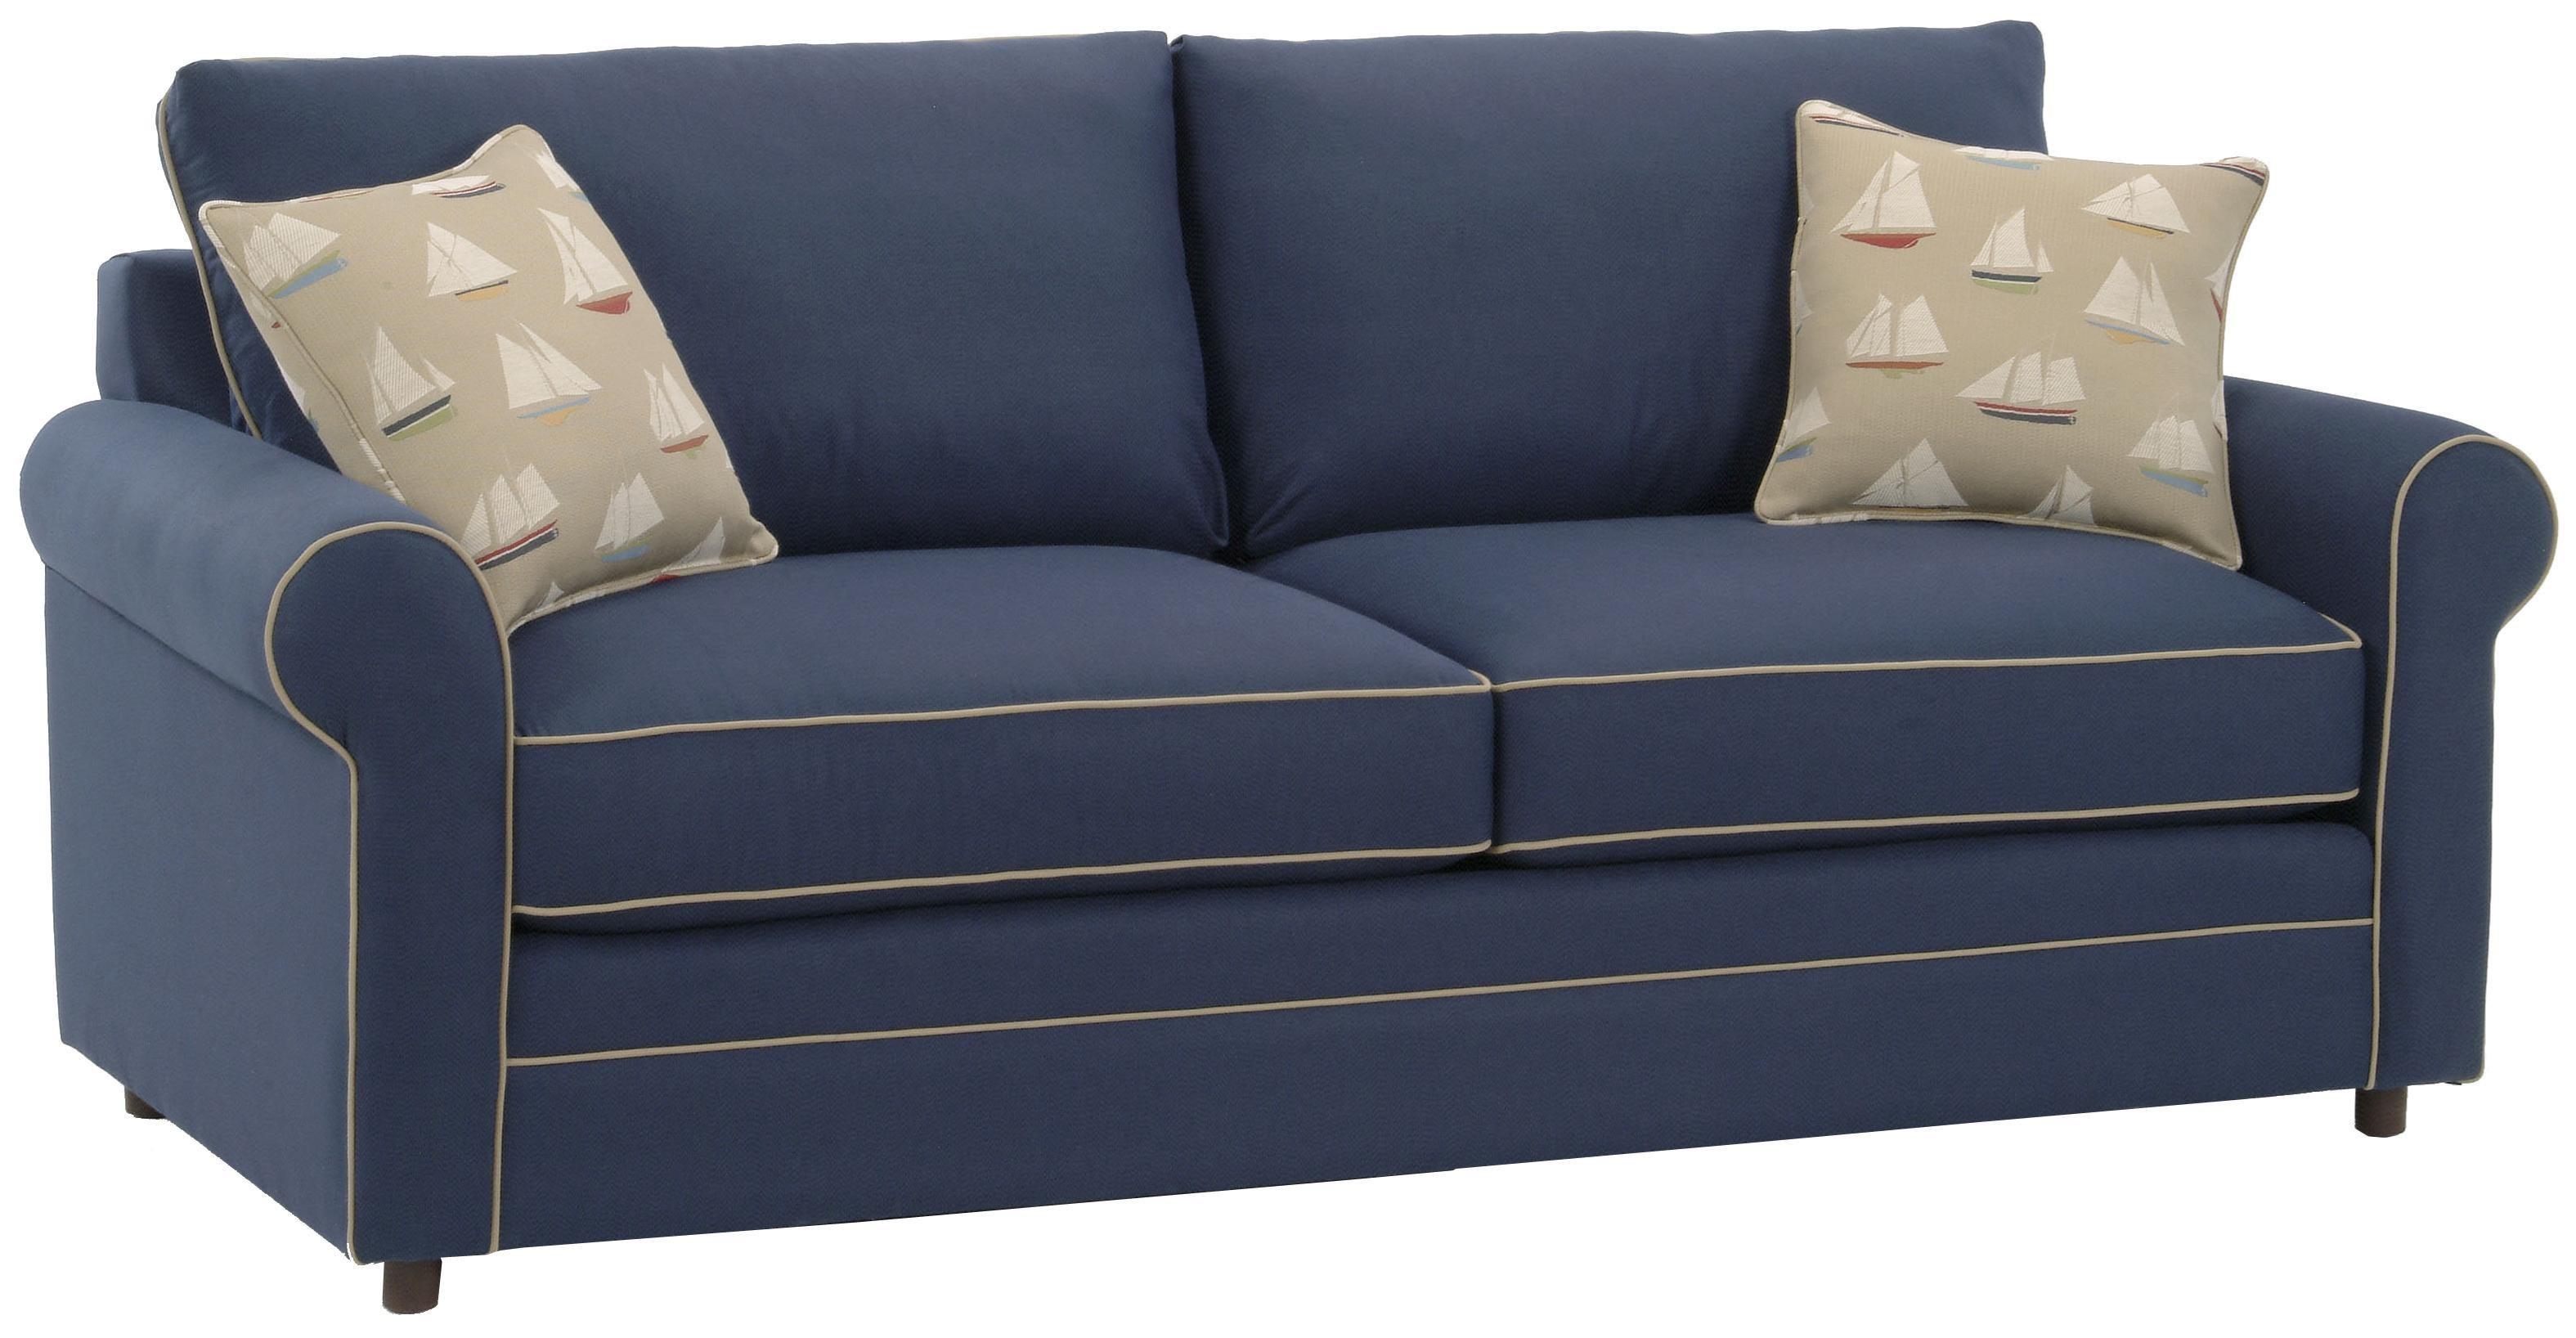 Upholstered Sleeper Sofa